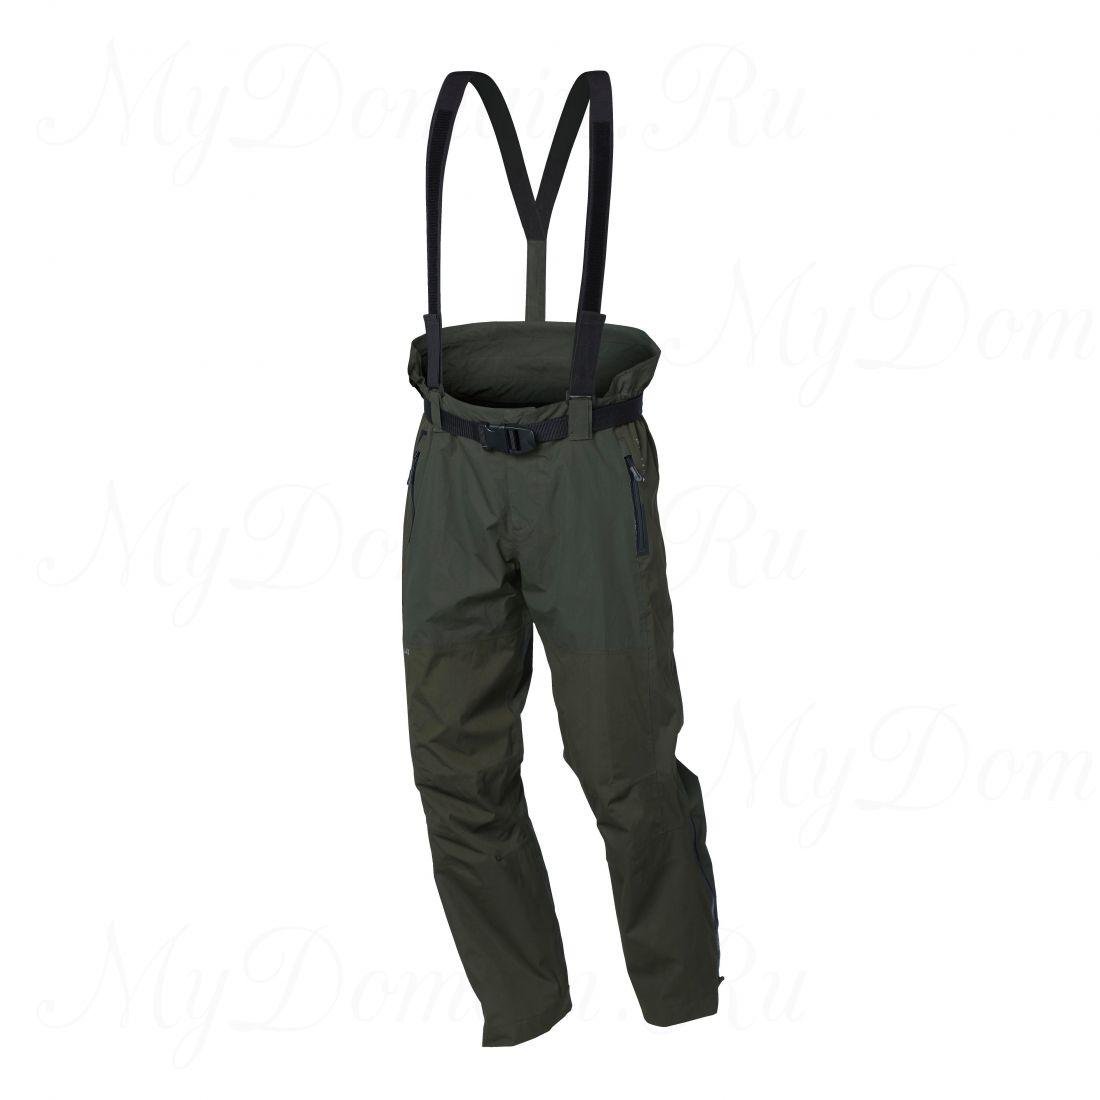 Брюки Westin W4 2-Layer Pant Two Leaf Green размер XL